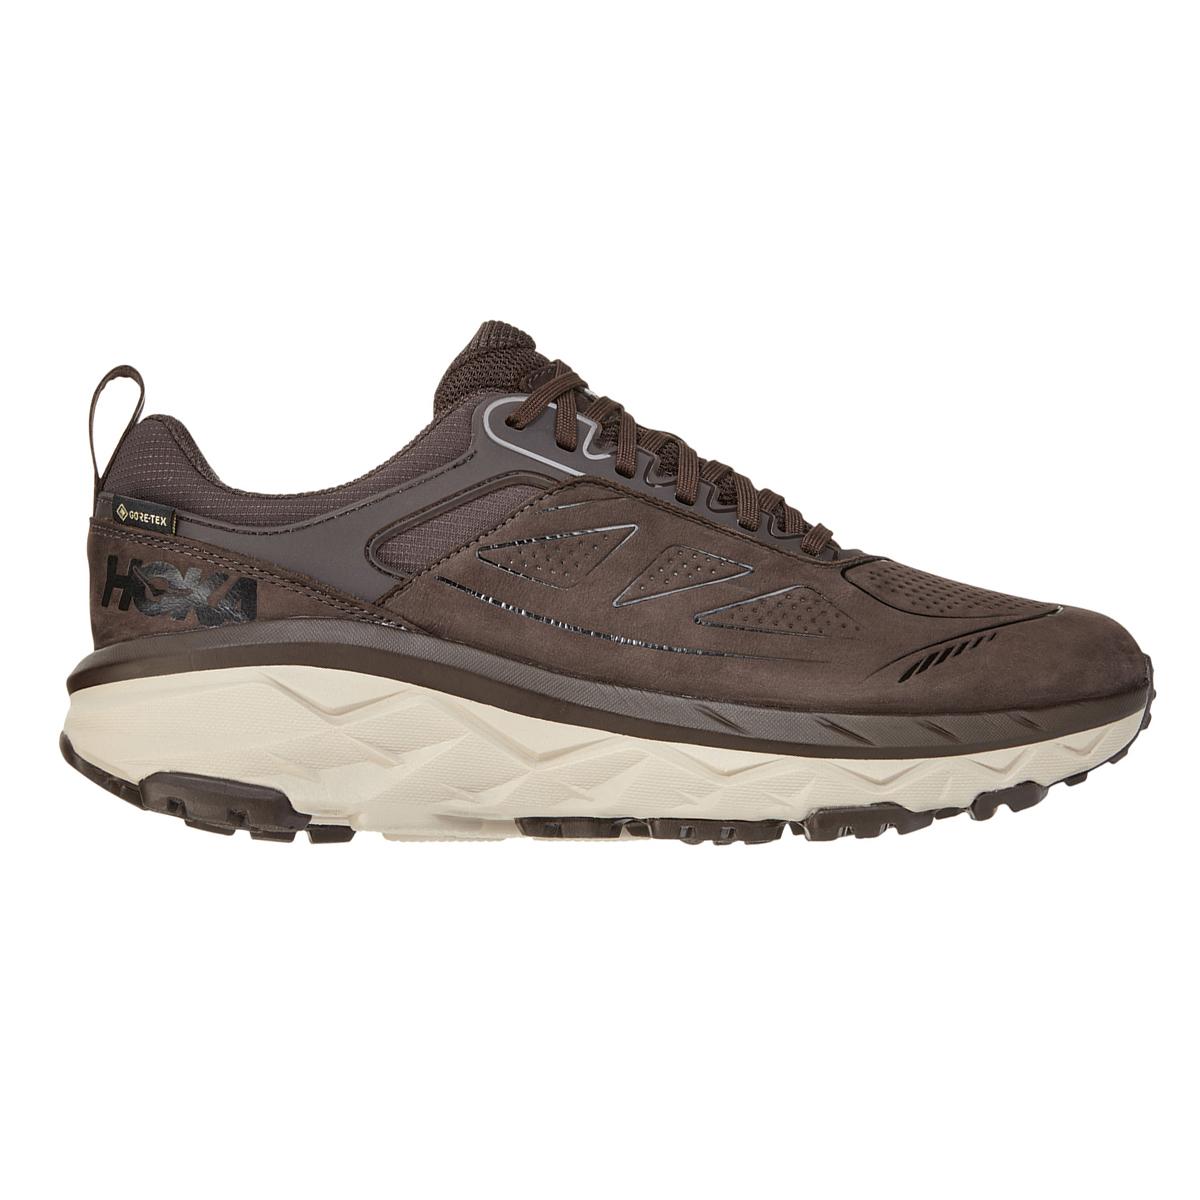 Men's Hoka One One Challenger Low Gore-Tex Trail Running Shoe - Color: Demitasse - Size: 7 - Width: Regular, Demitasse, large, image 1